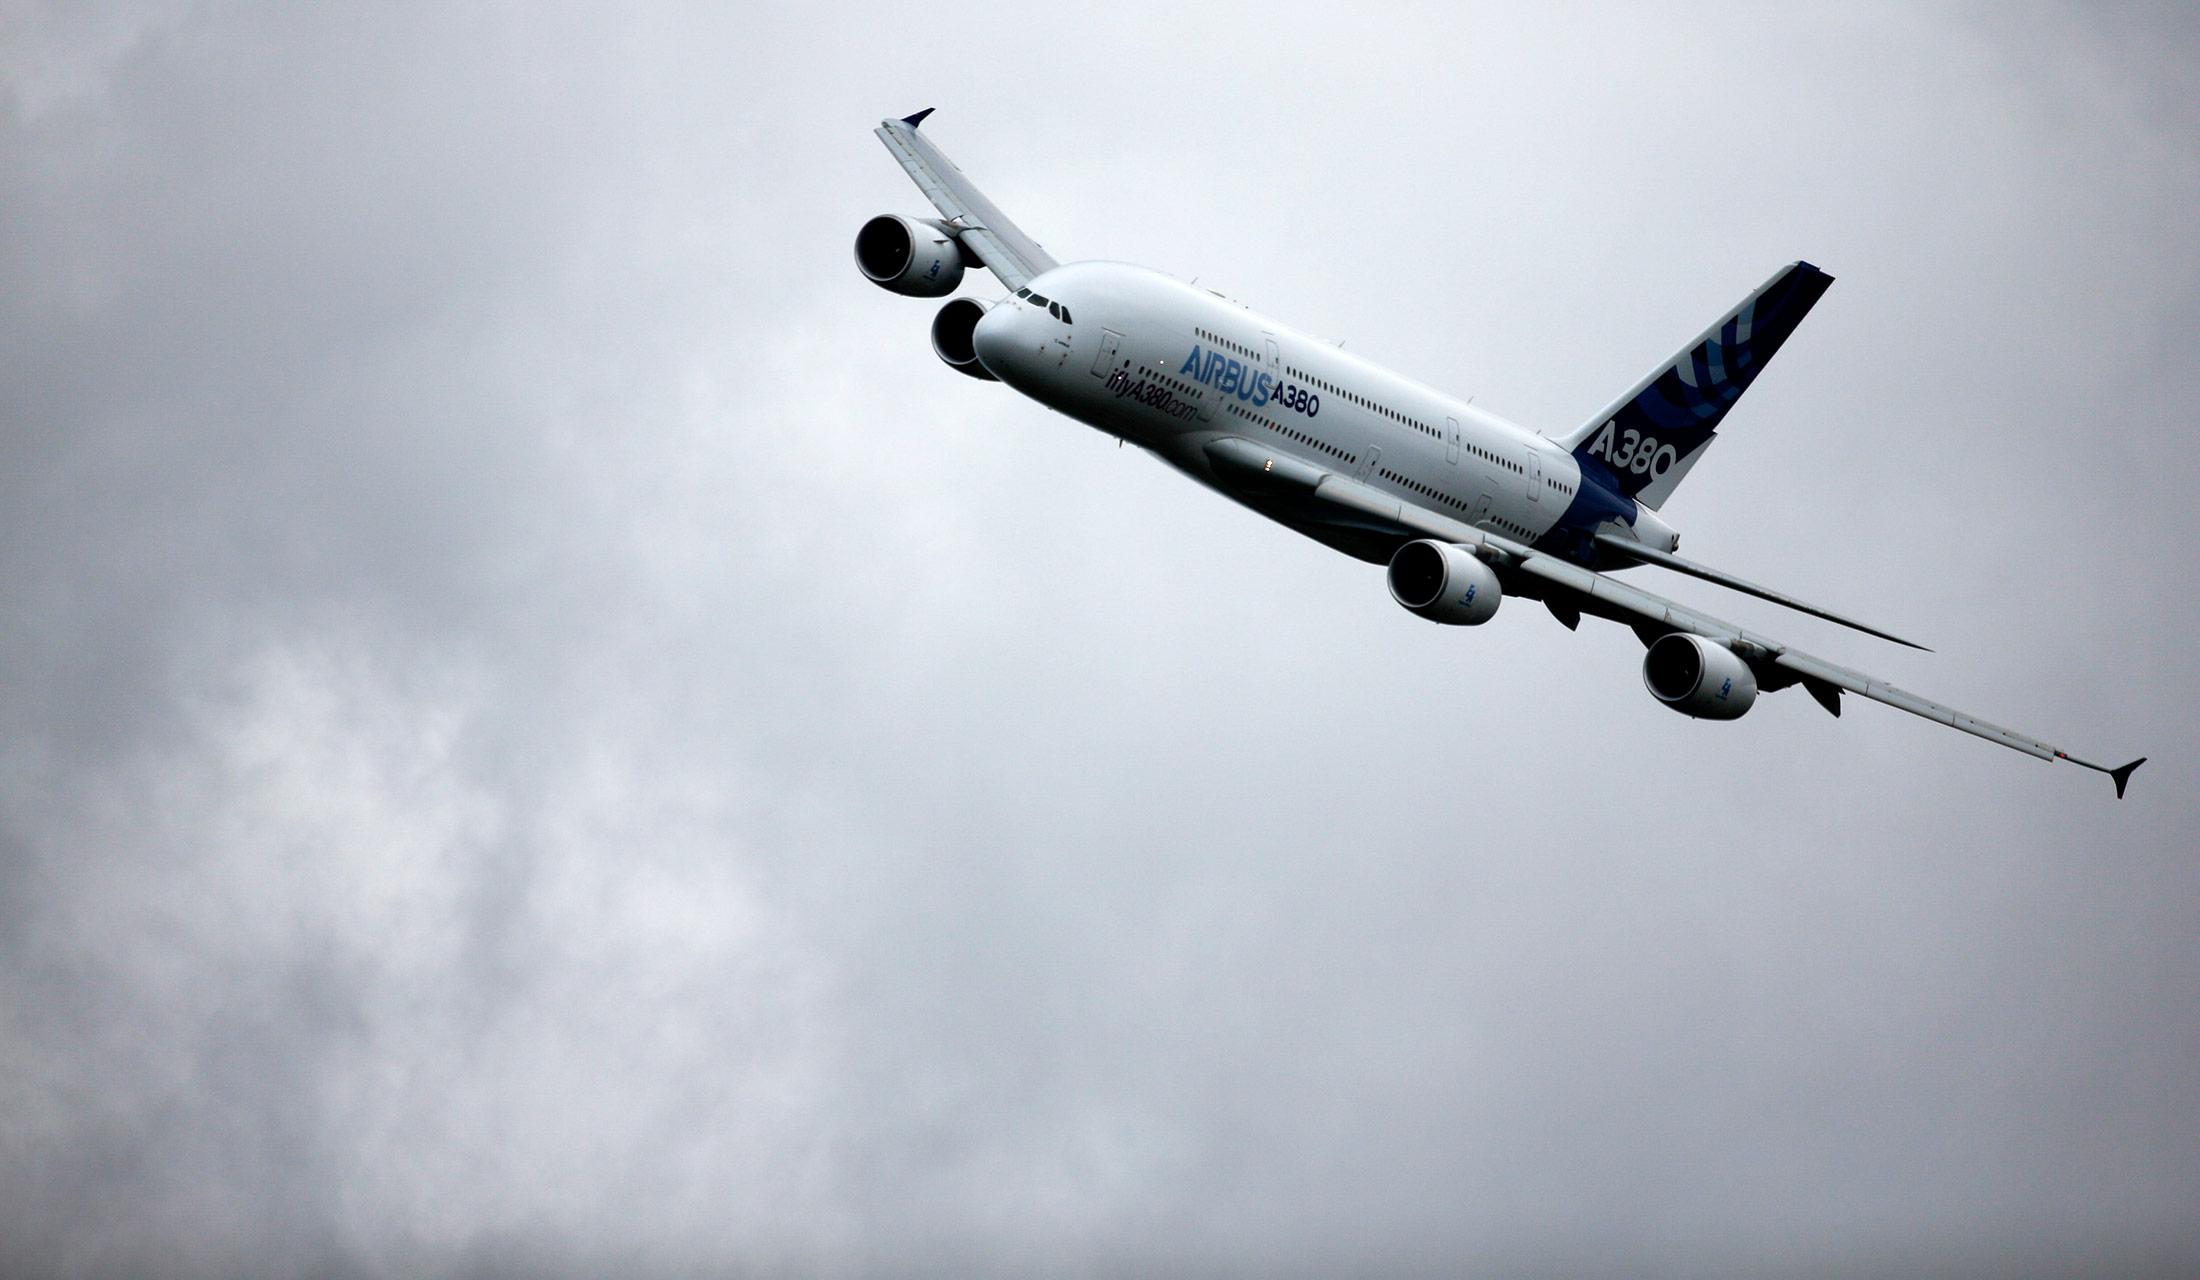 Future of Airbus A380 Superjumbo Hinges on Emirates Order